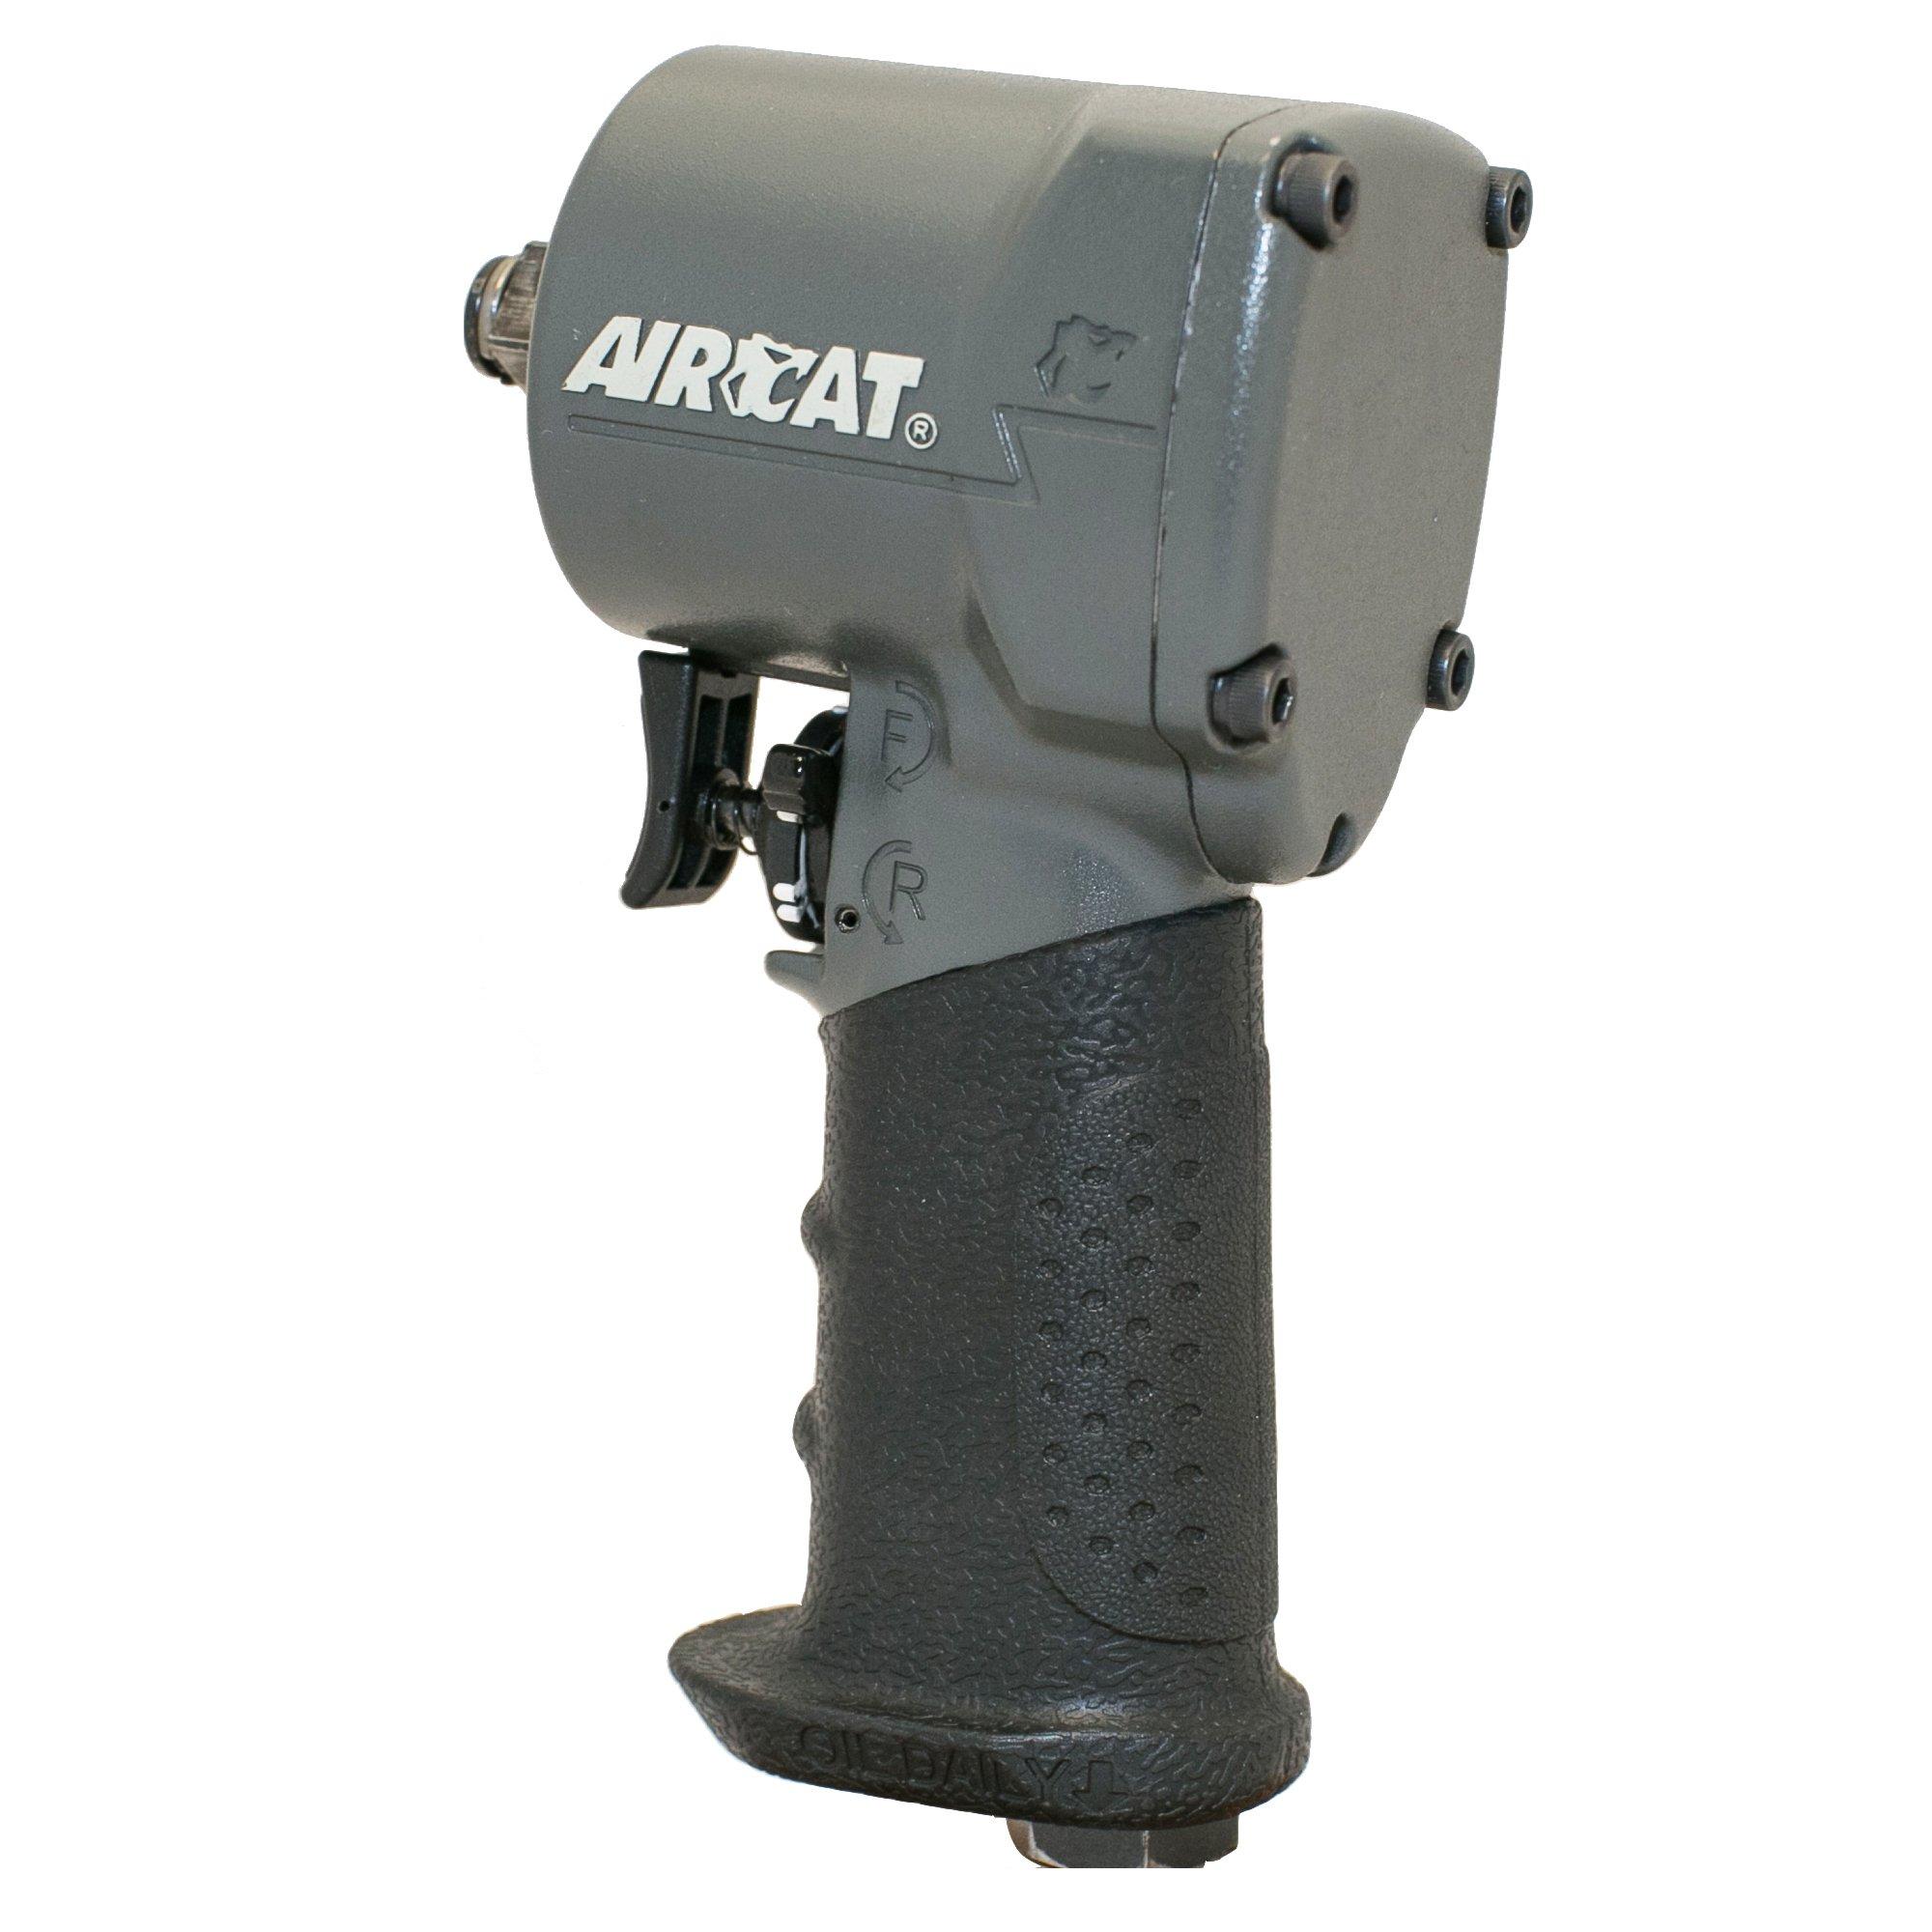 AIRCAT 1077-TH 3/8'' Impact Wrench, Compact, Grey